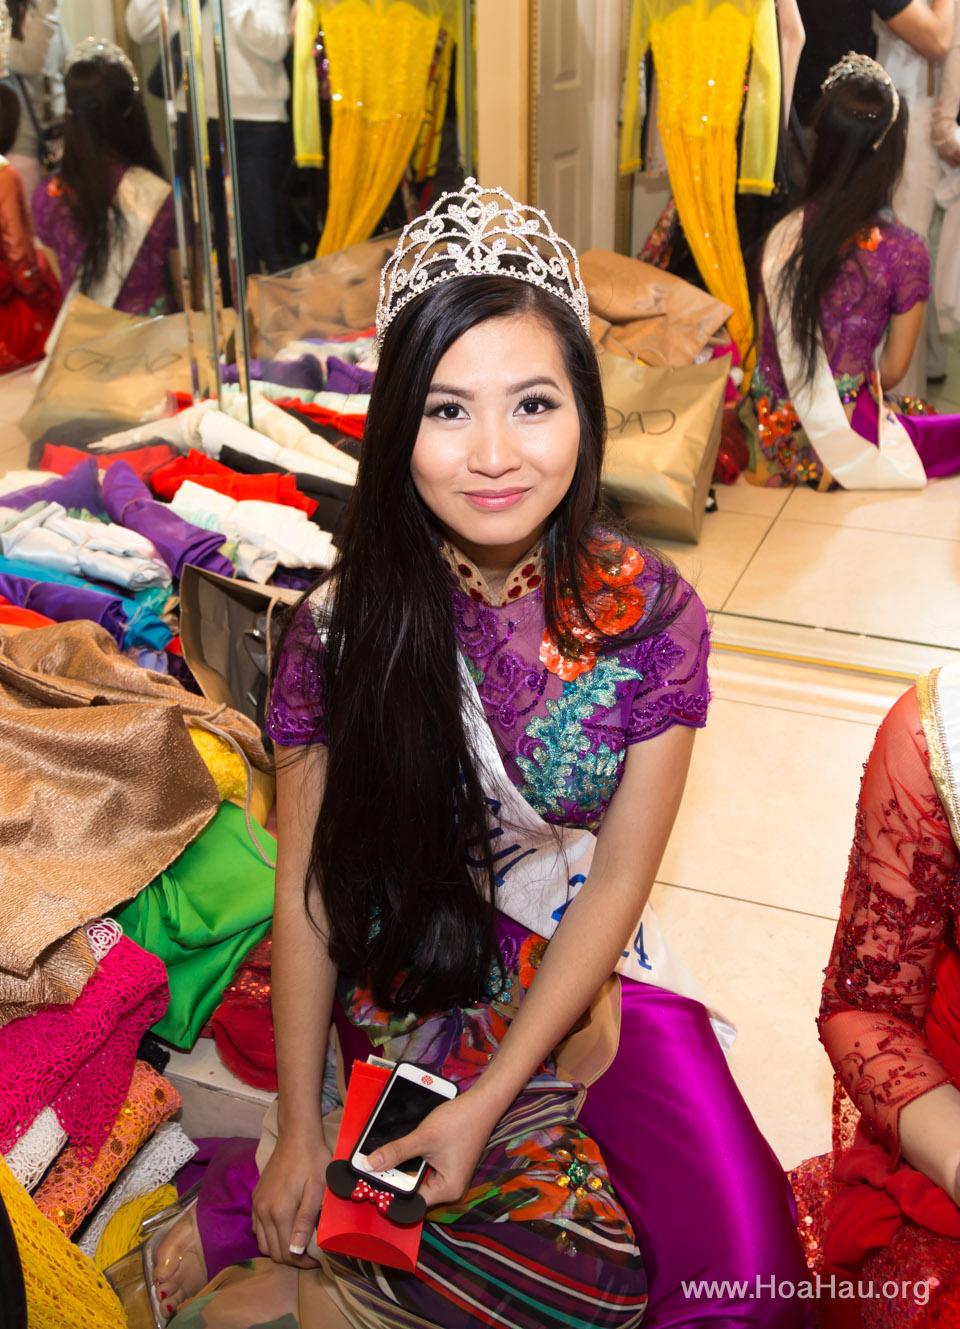 Tet Festival 2014 at Vietnam Town - Hoa Hau - Miss Vietnam - Image 226